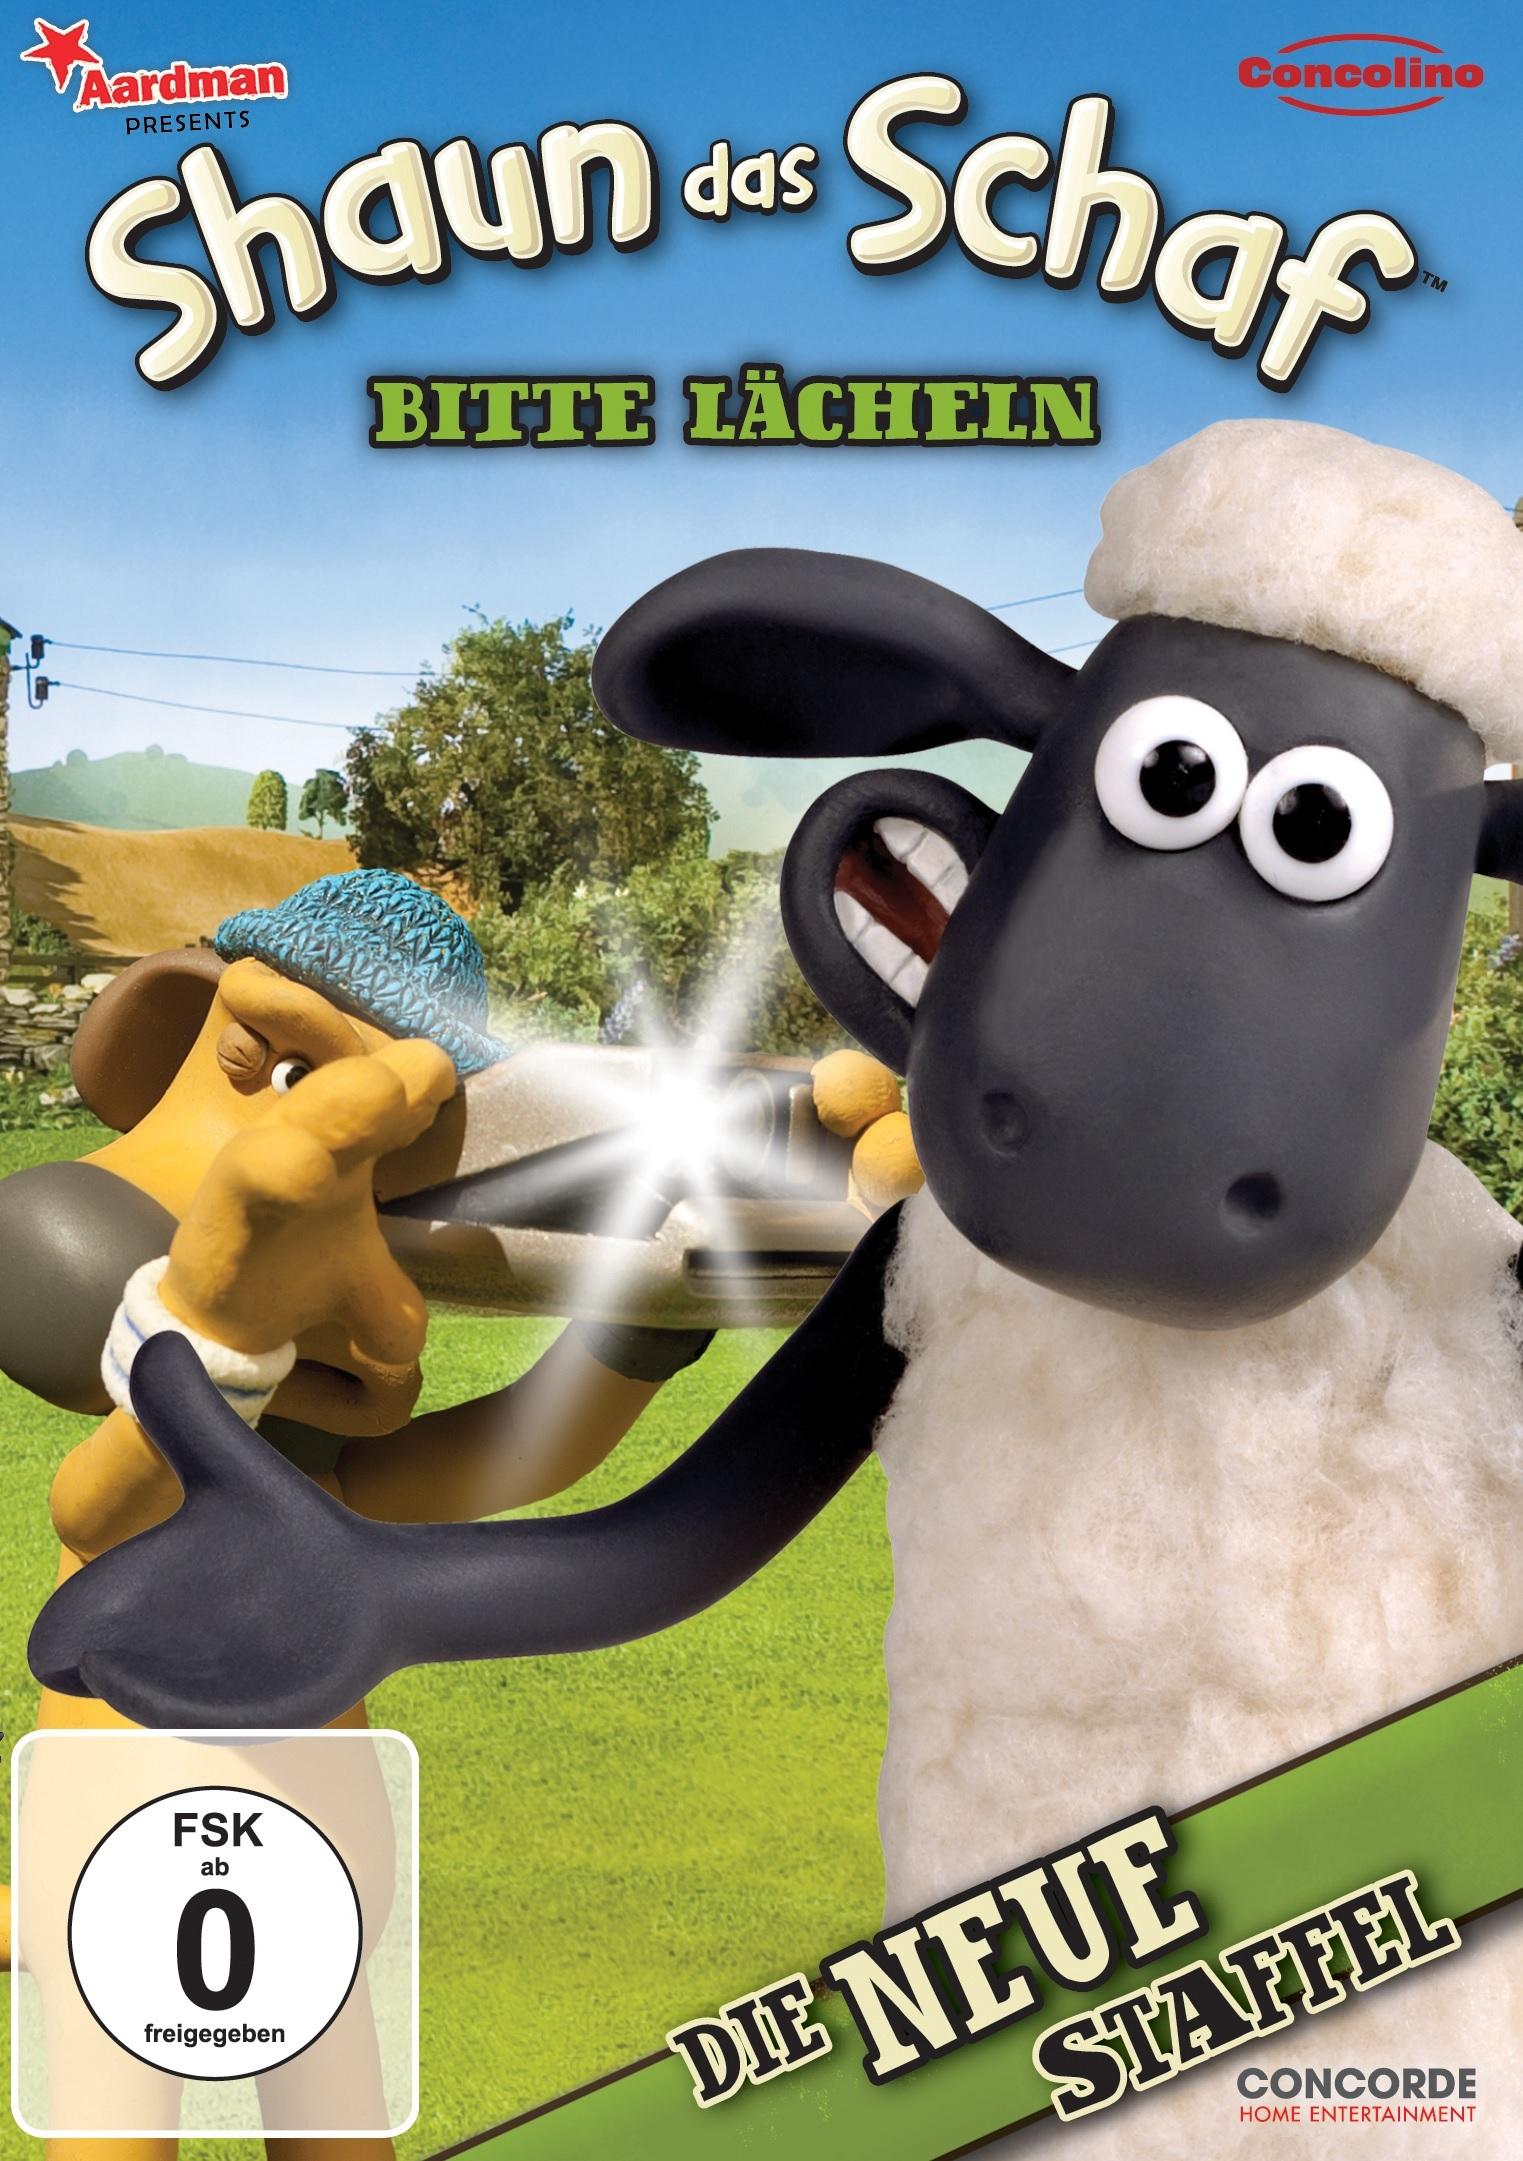 Image of Shaun das Schaf - Bitte lächeln